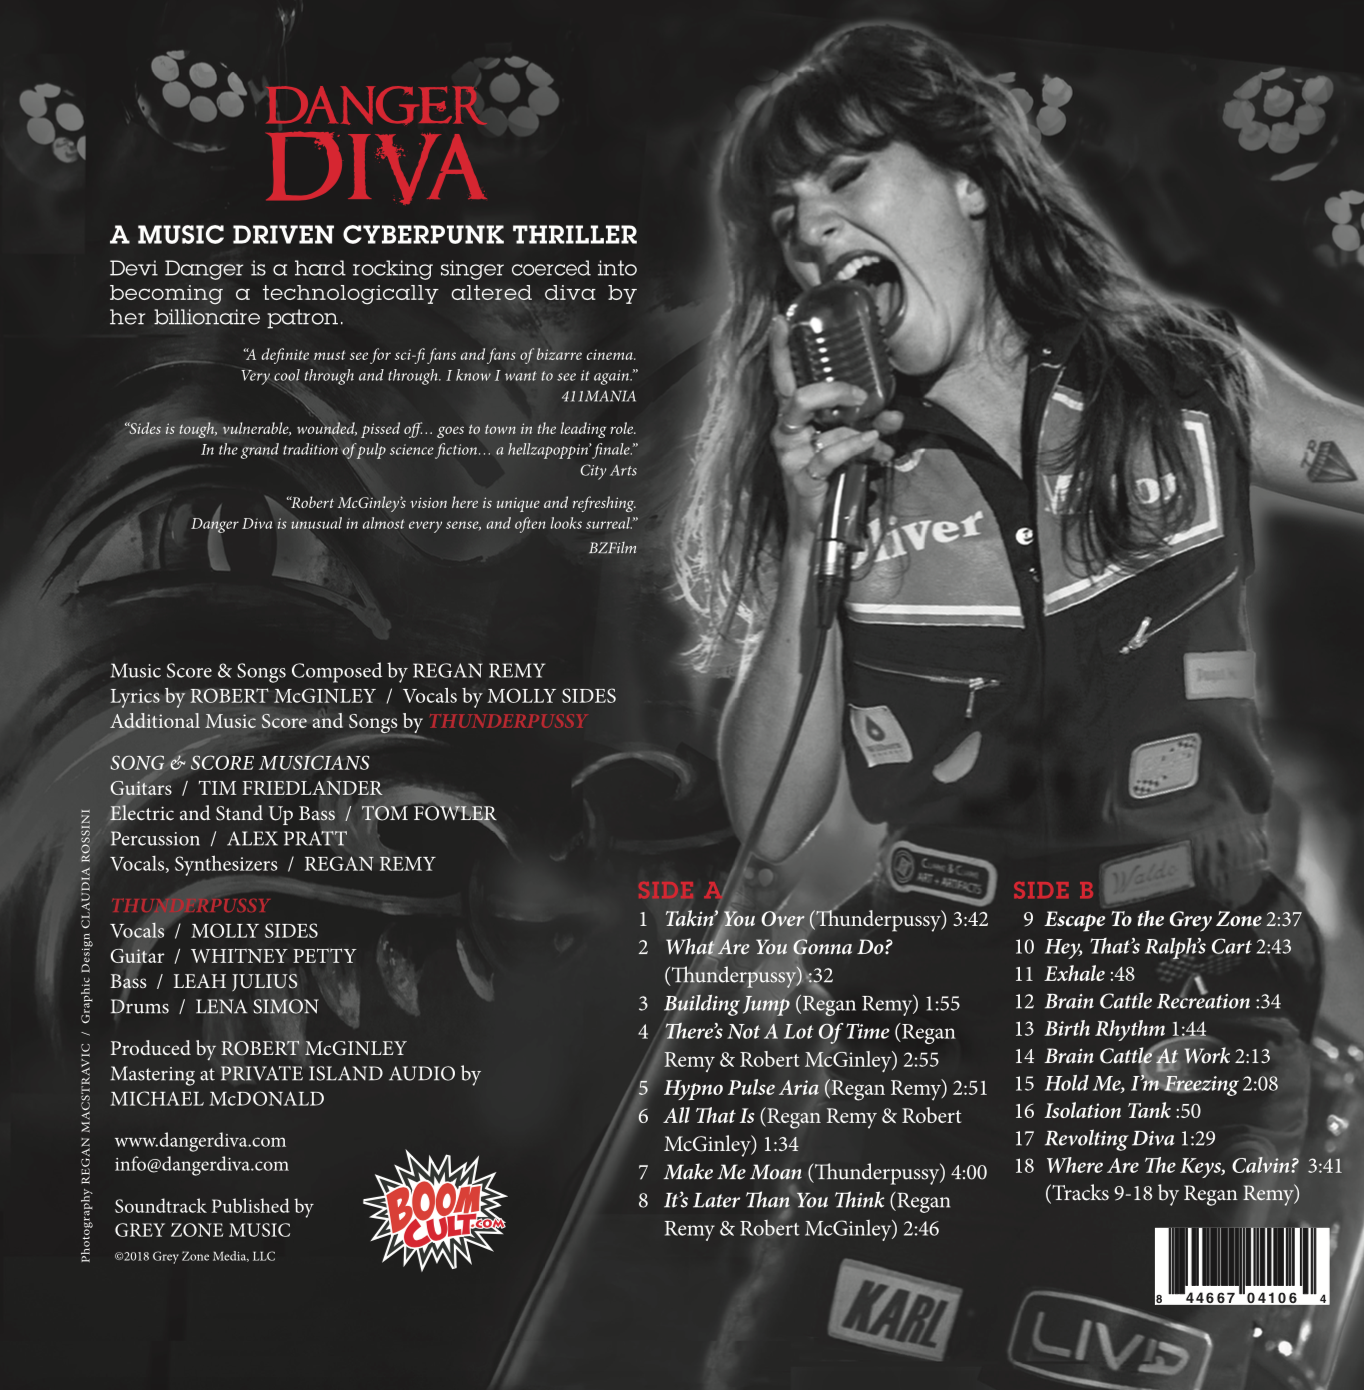 Danger Diva (Original Motion Picture Soundtrack plus DVD movie)